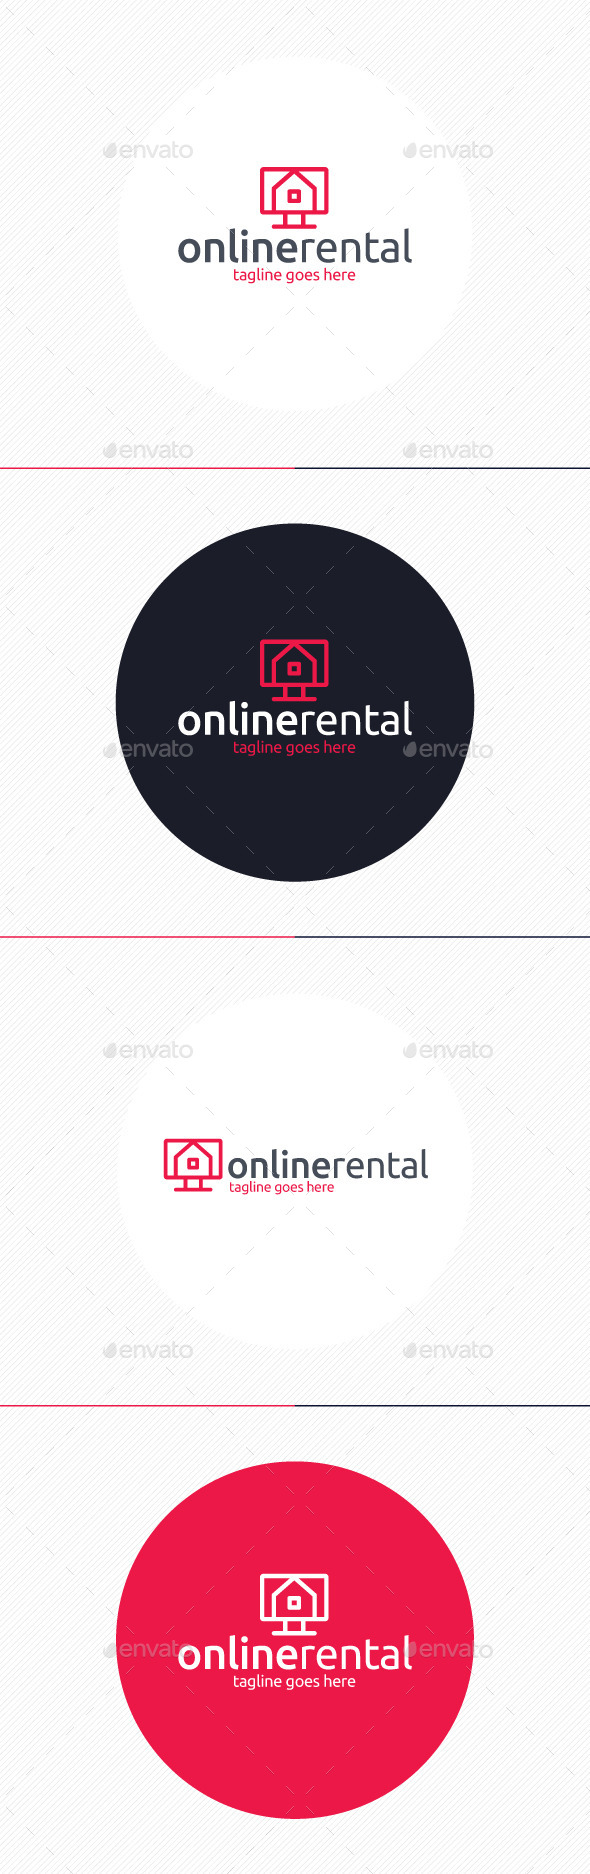 GraphicRiver Online Rental Logo 9760197